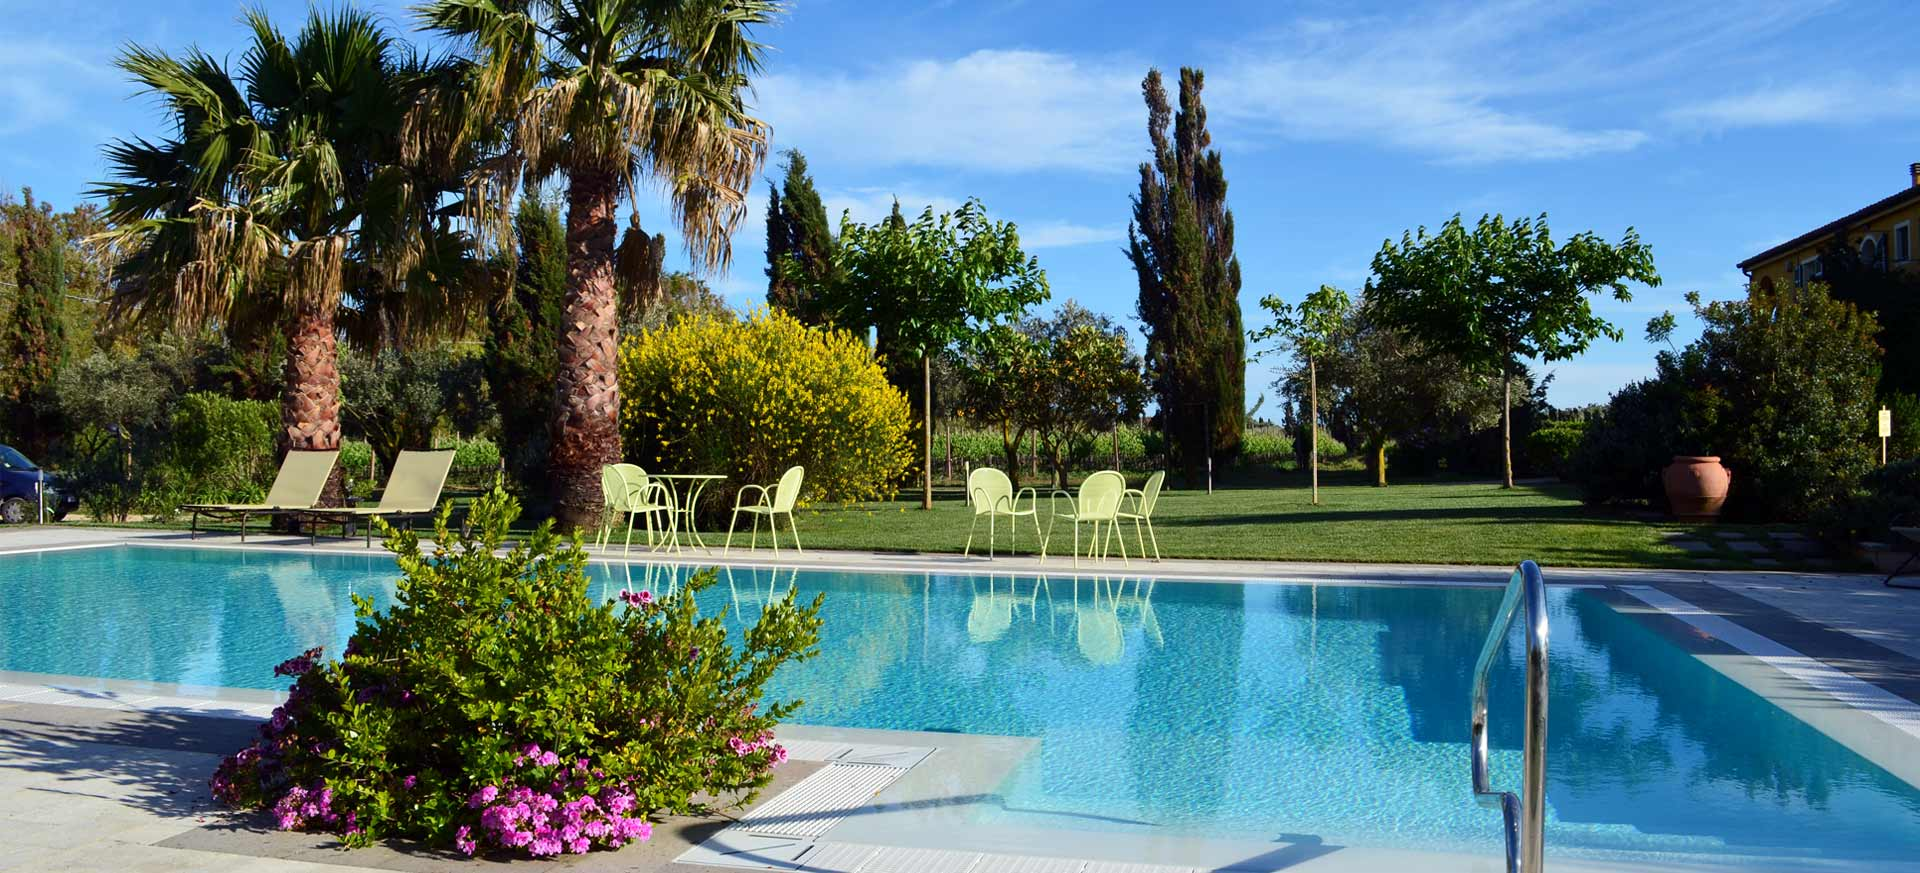 Sardinia Charming Hotels - Small luxury hotels Sardinia ...